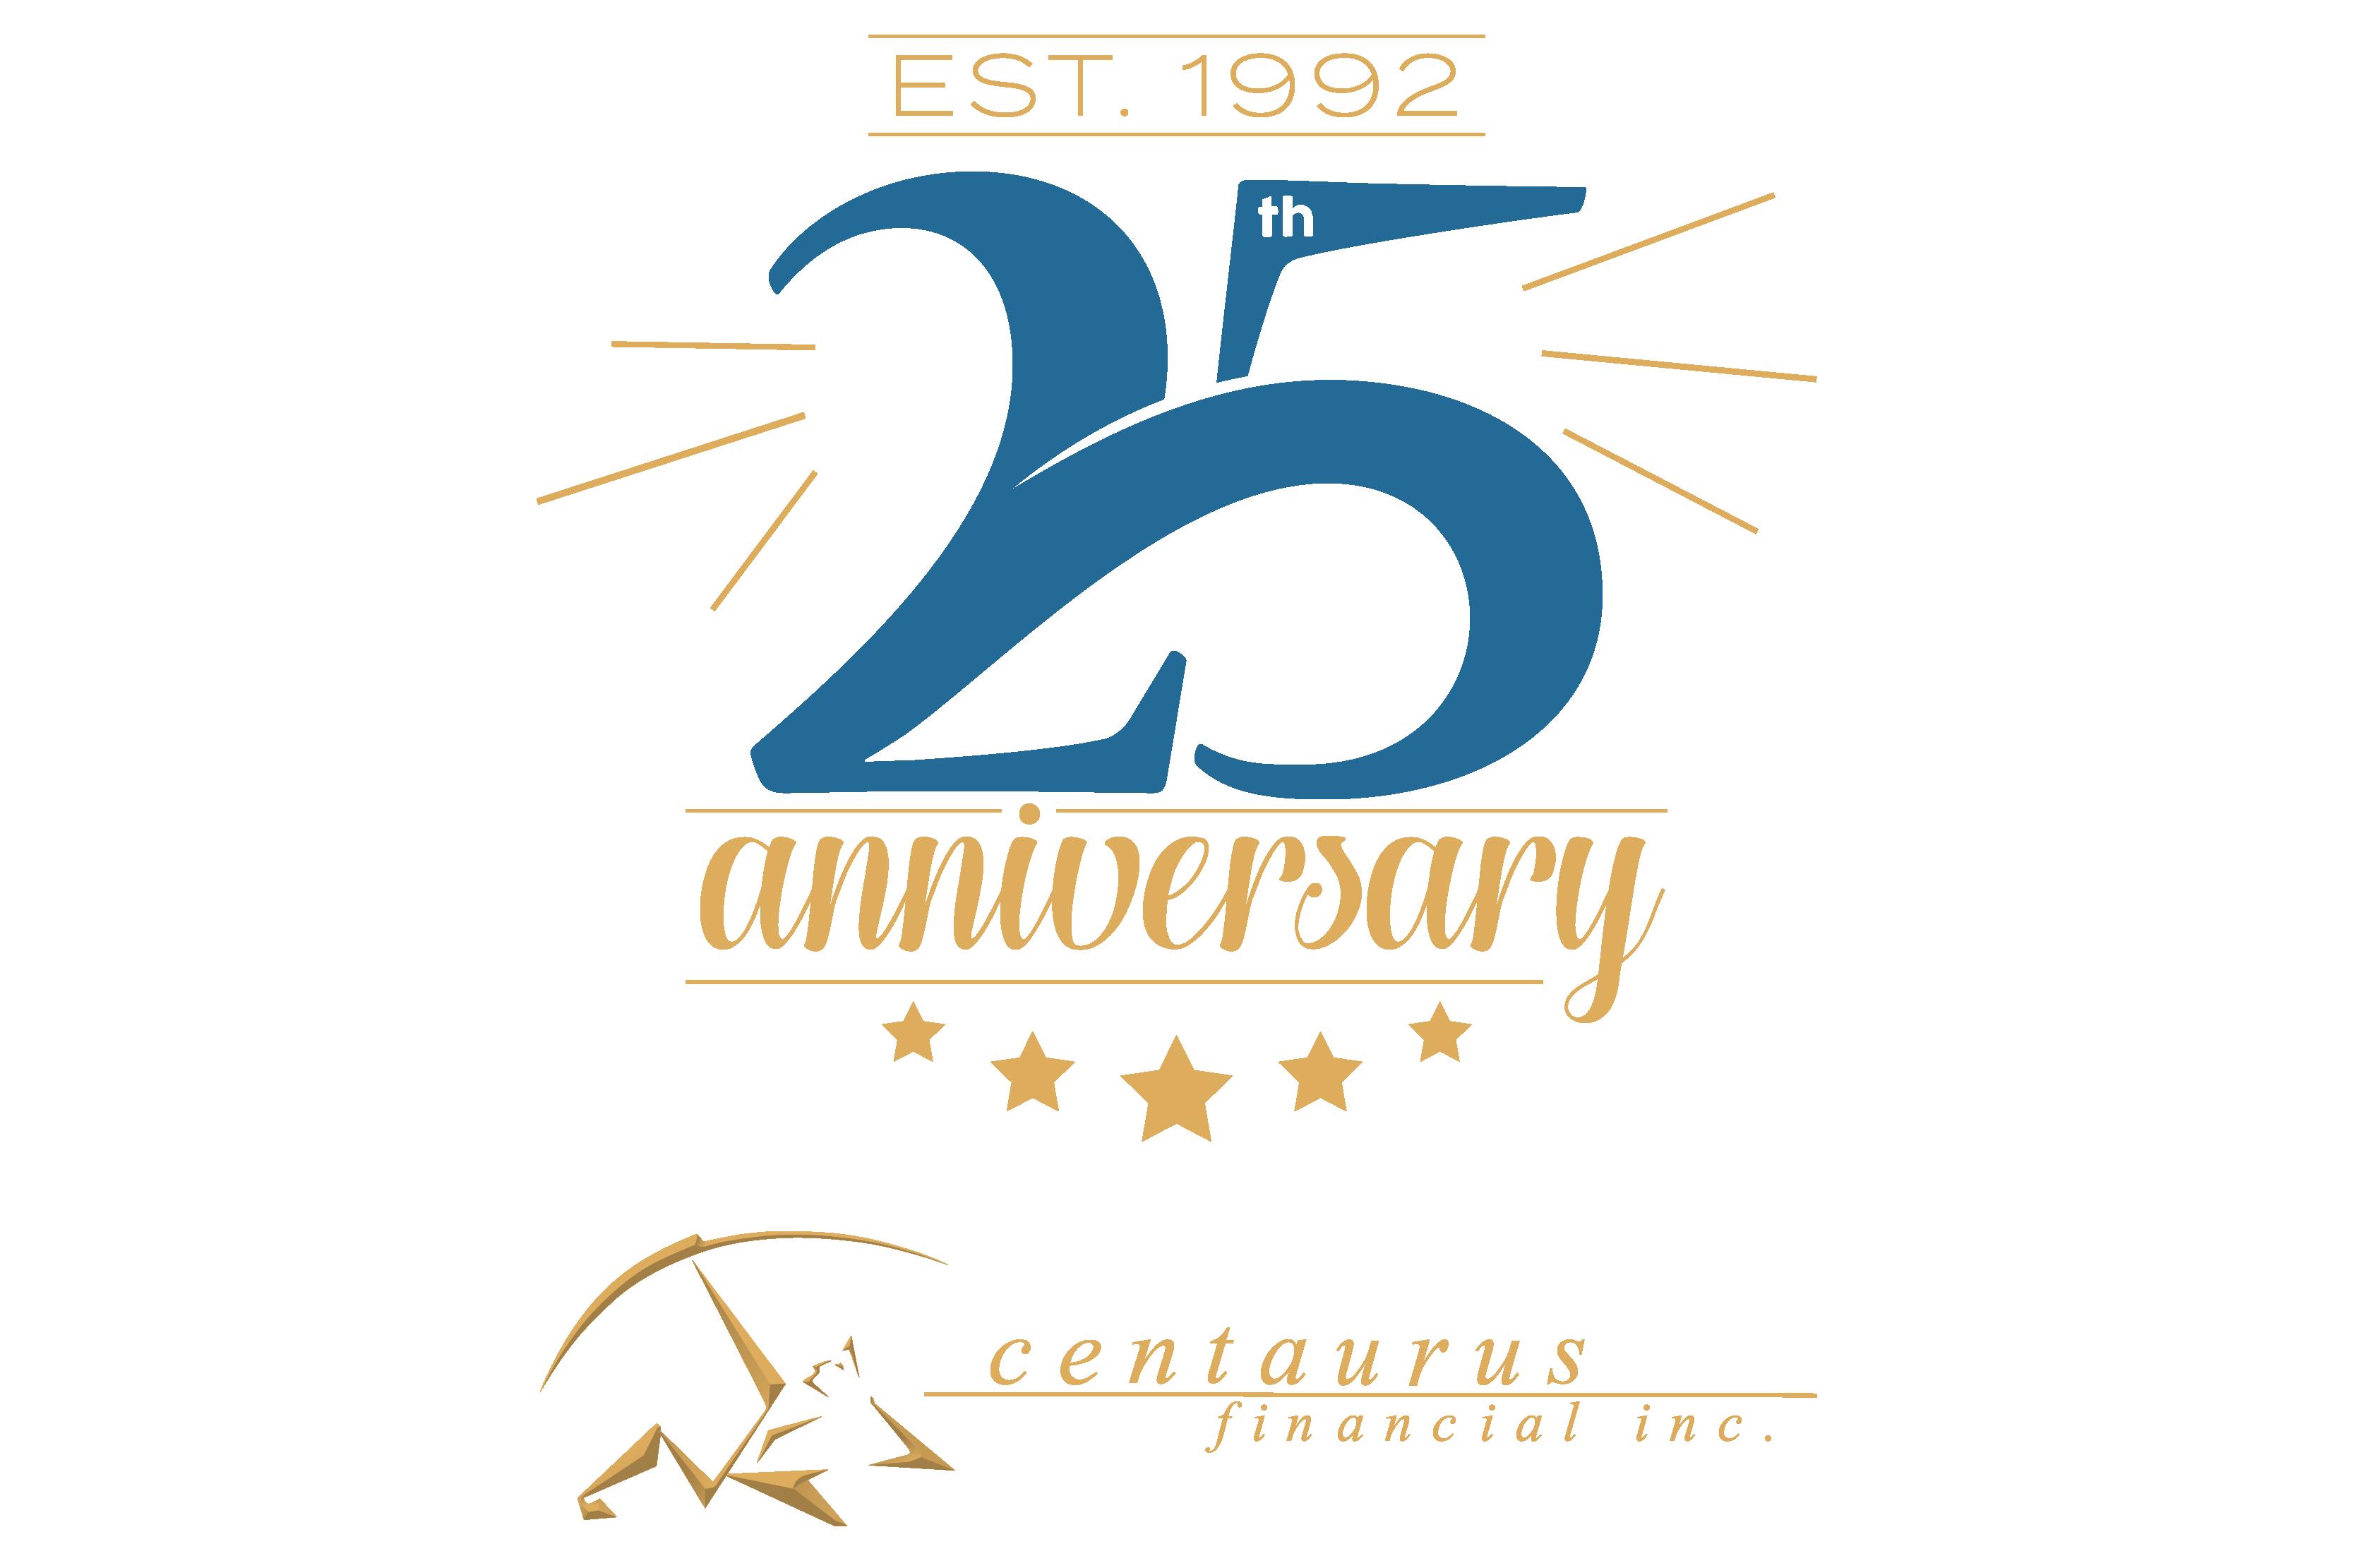 centaurus financial  inc celebrates 25th anniversary 25th Anniversary Logo Ideas Construction 25th Anniversary Company Logo